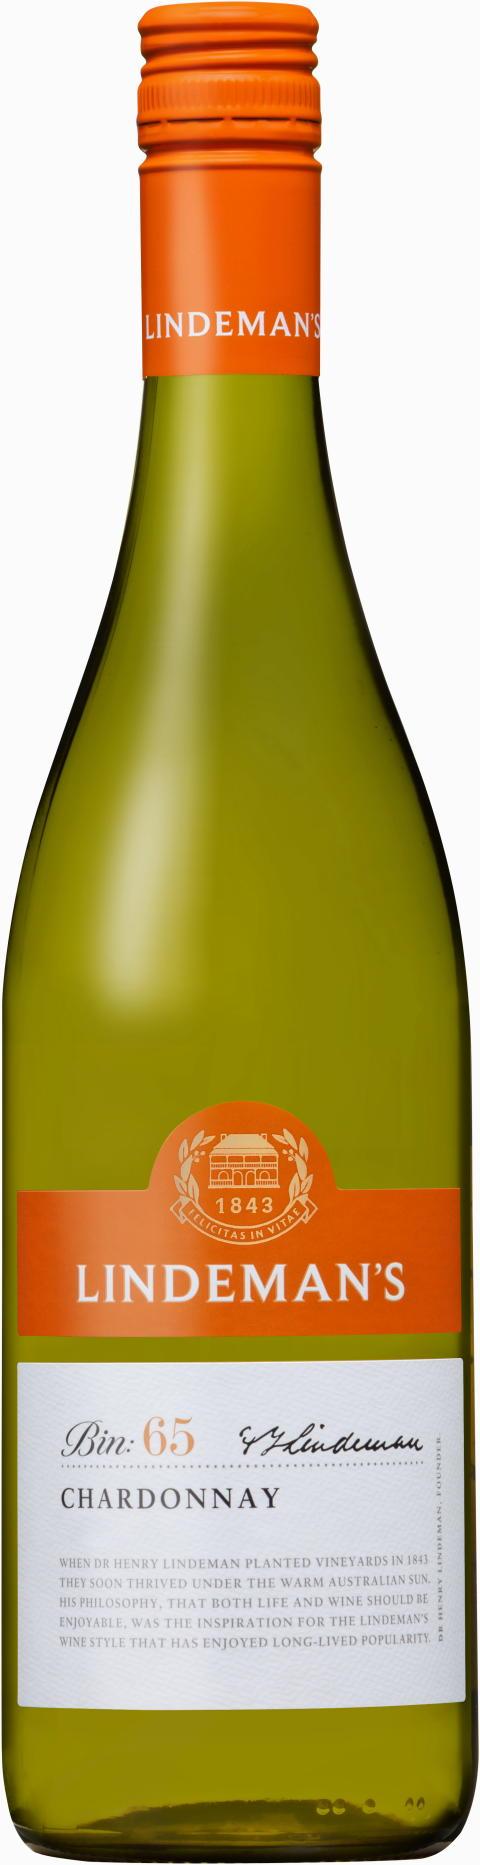 Lindemans Bin 65 Chardonnay 2015